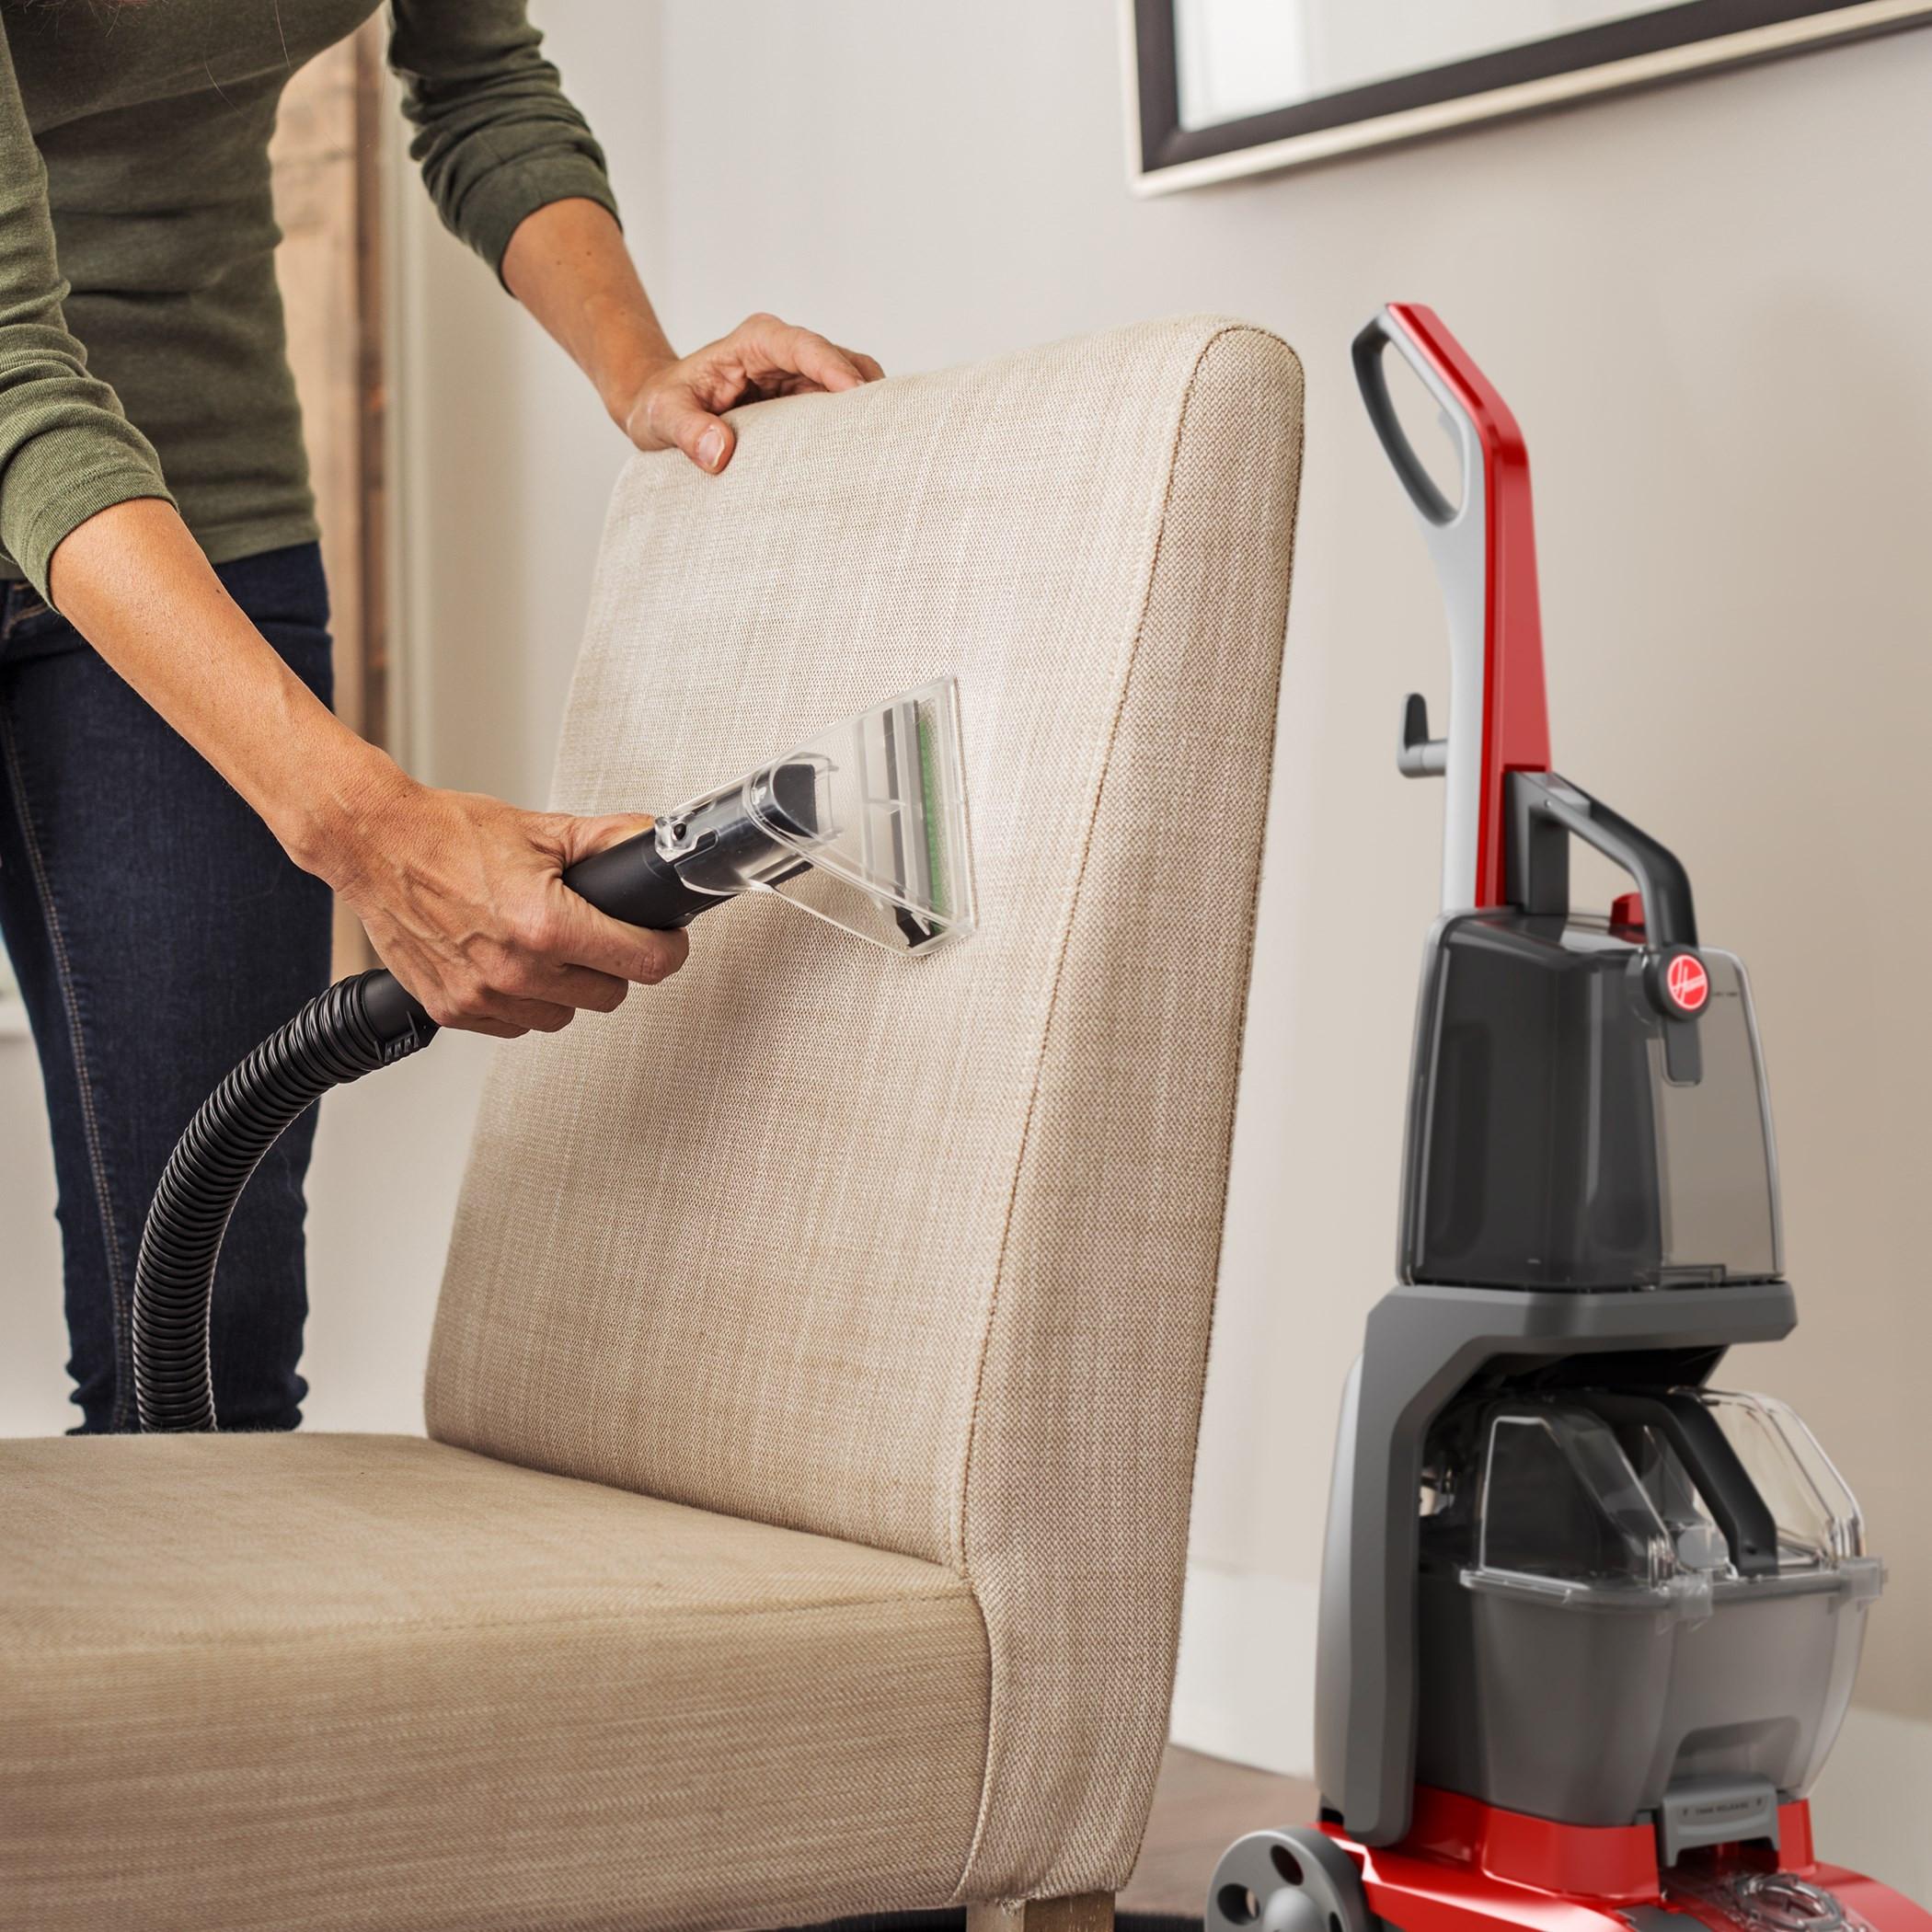 hardwood floor washer vacuum of hoover power scrub carpet cleaner w spinscrub technology fh50135 pertaining to hoover power scrub carpet cleaner w spinscrub technology fh50135 walmart com